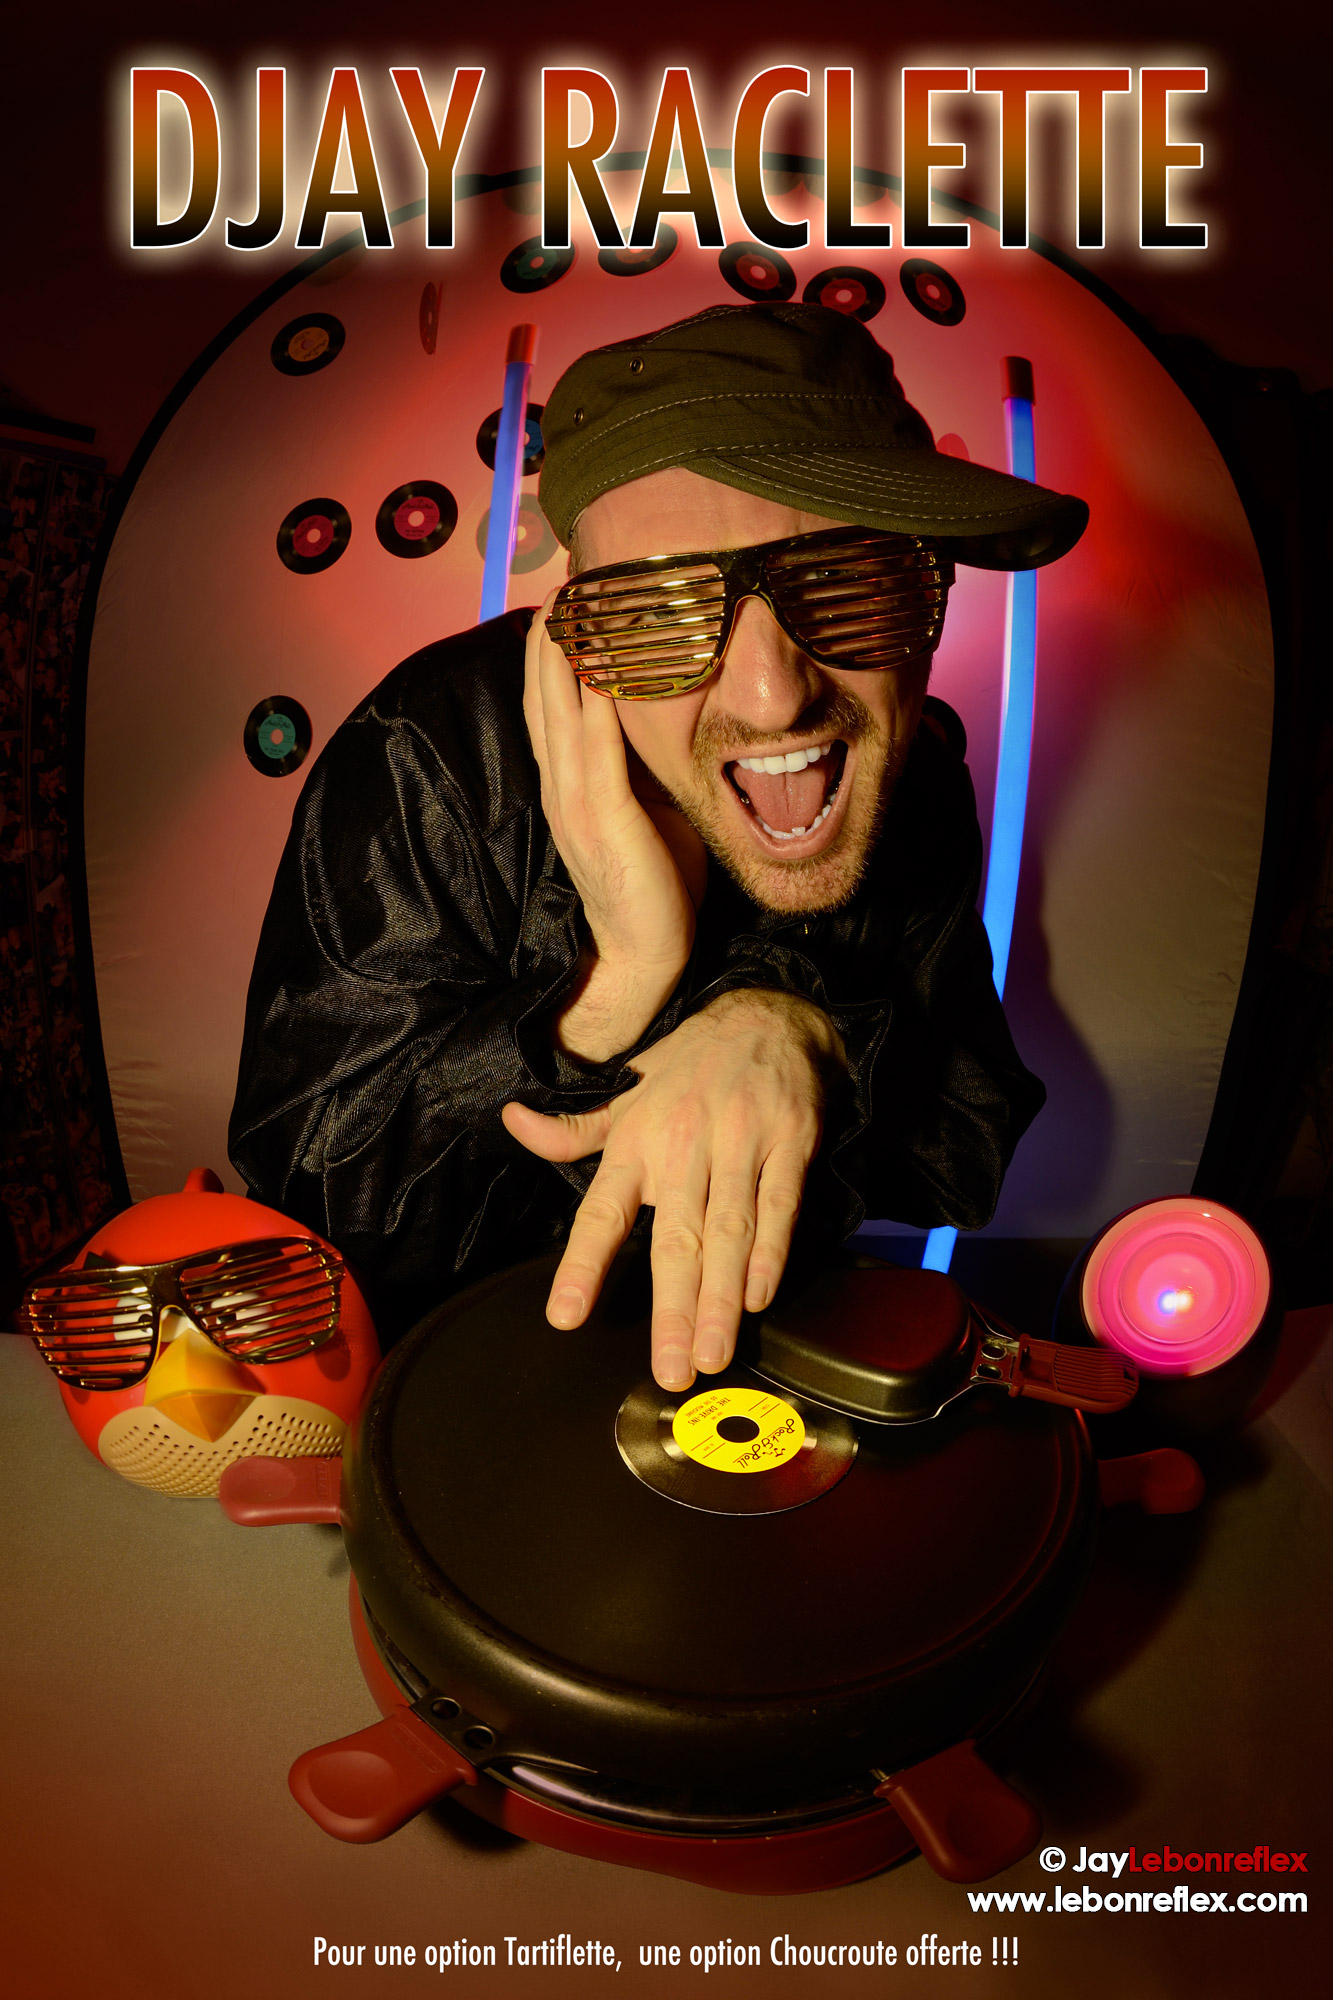 DJay Raclette